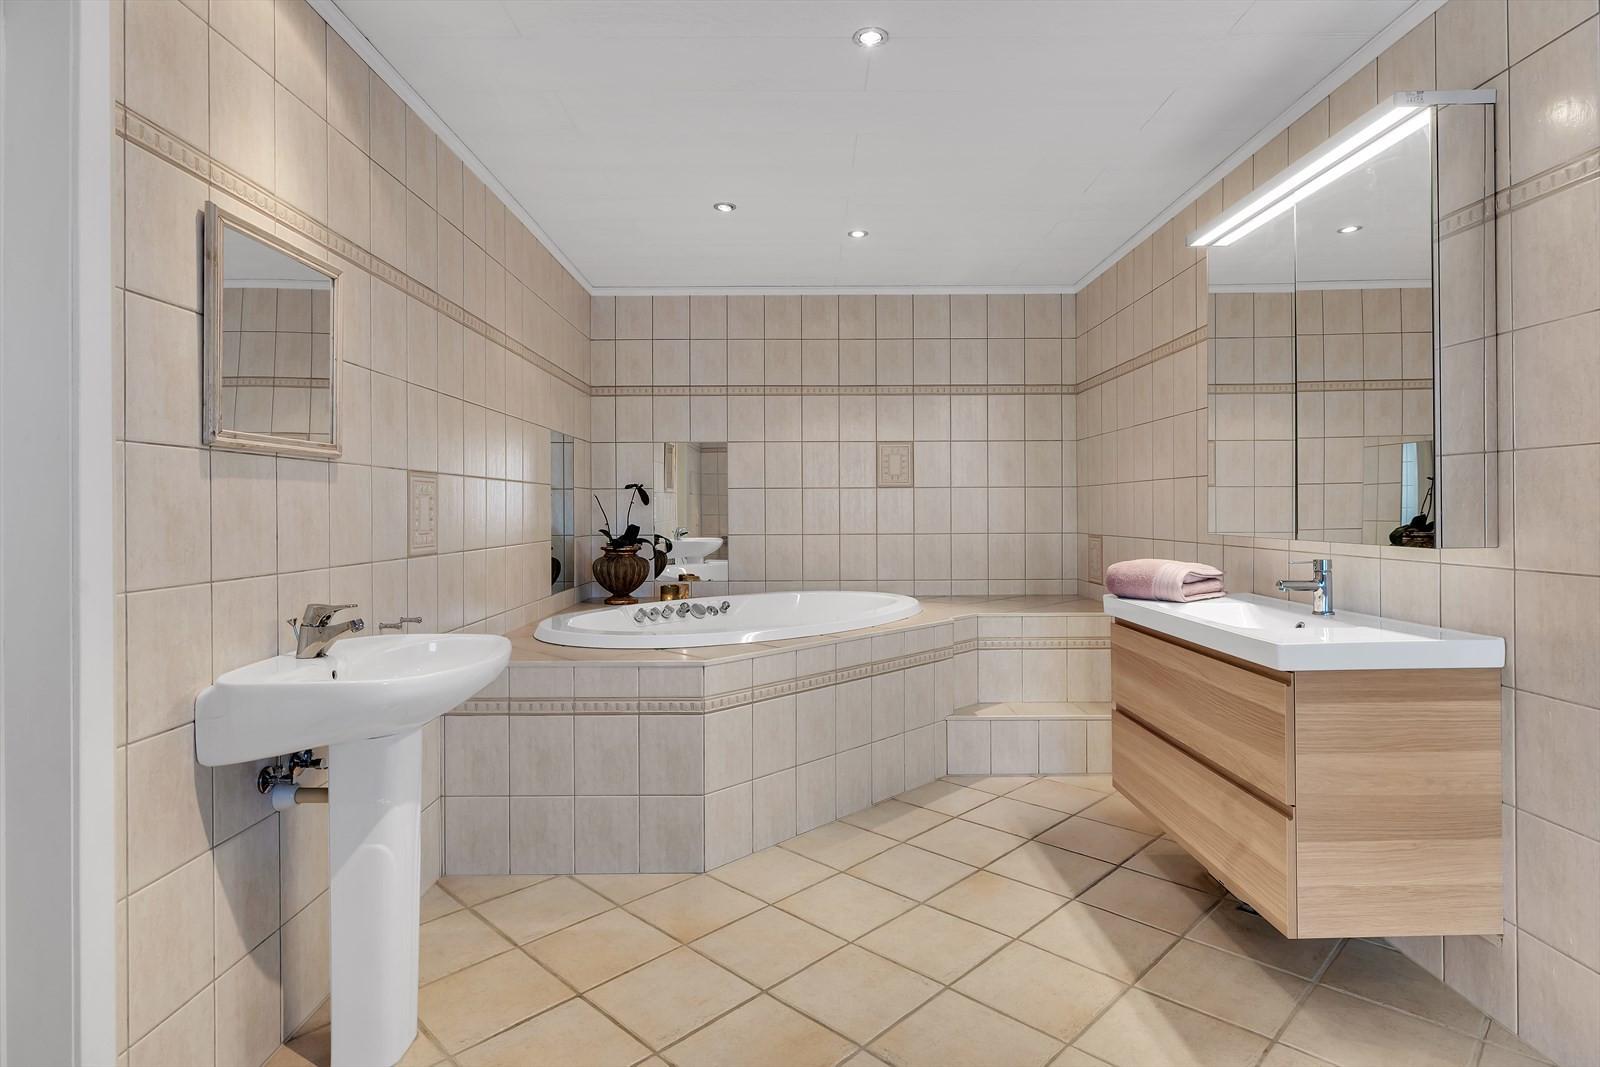 Badet i plan 1 er helt nydelig. Stort, tidløst og har både dusjnisje og boblebad.